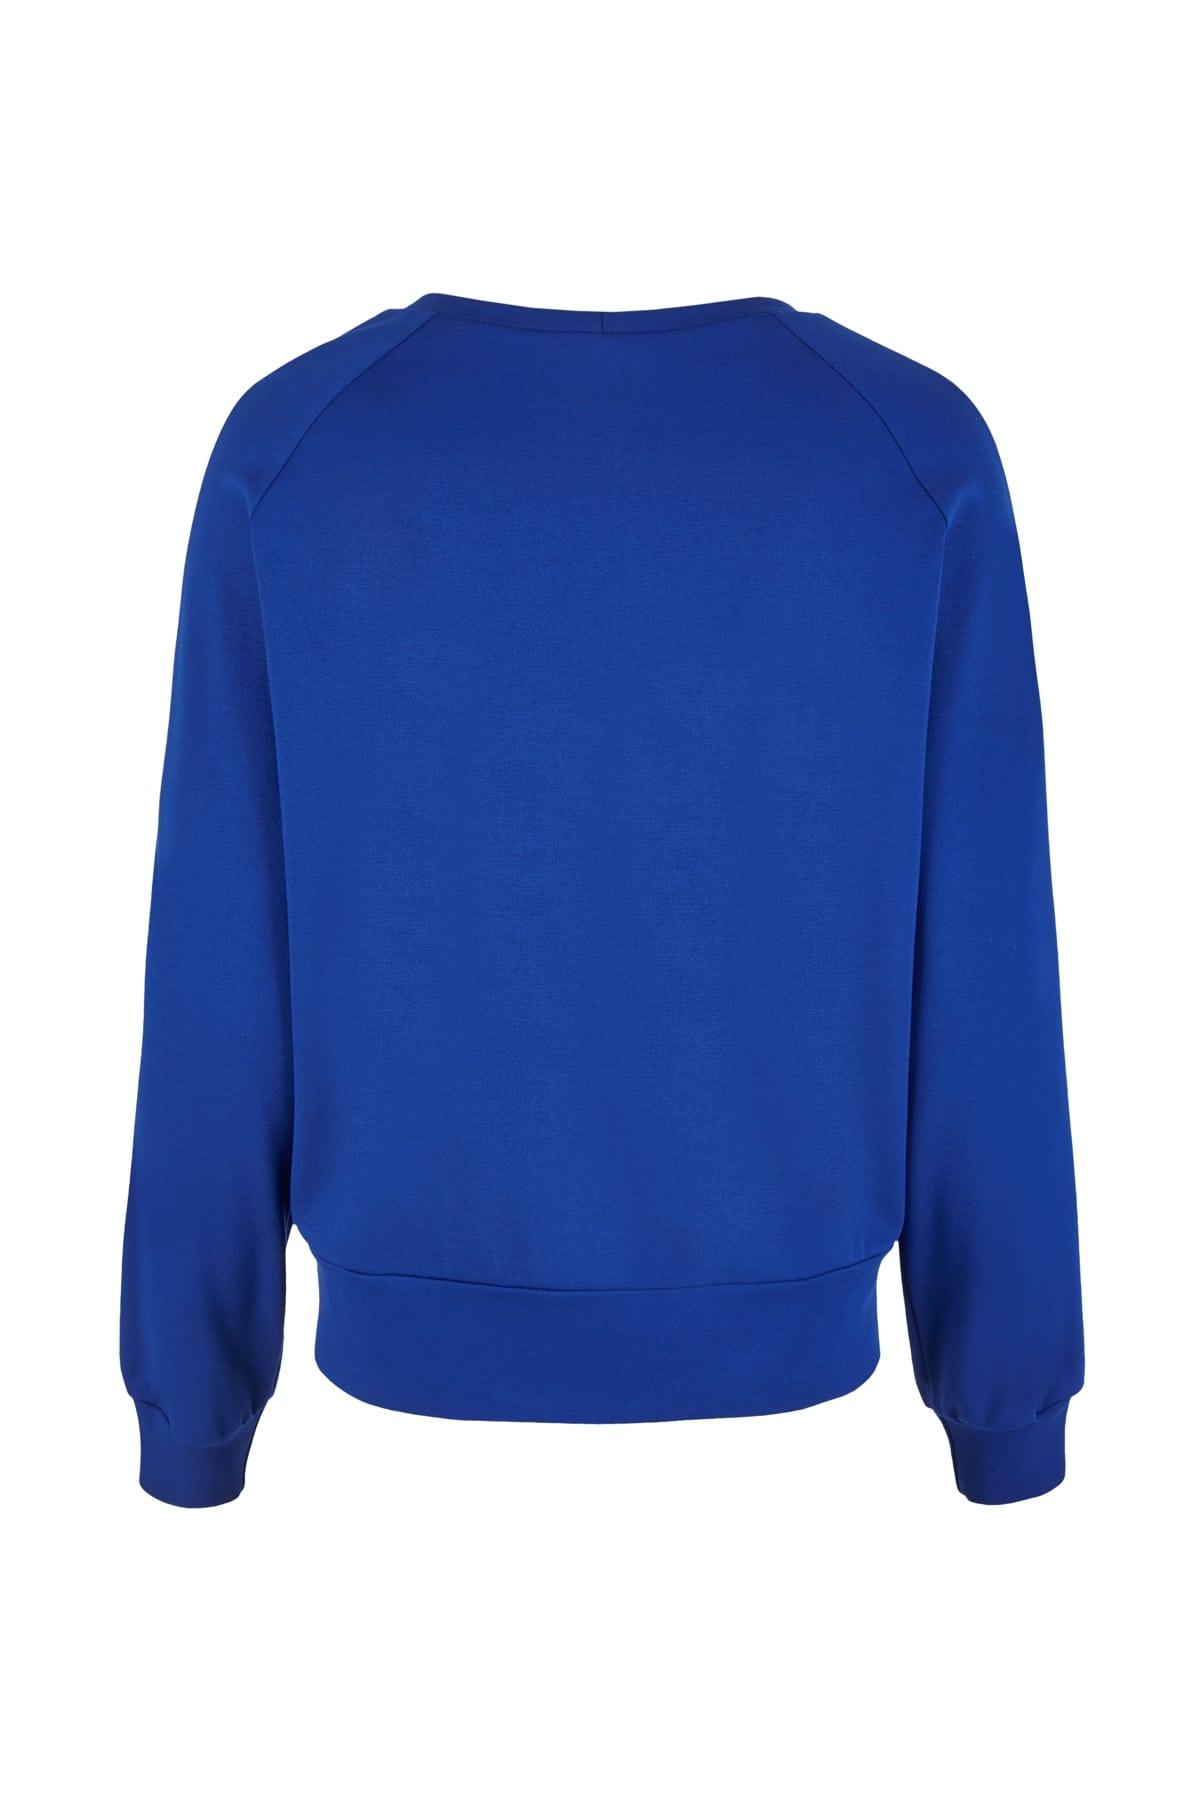 sweater blue back